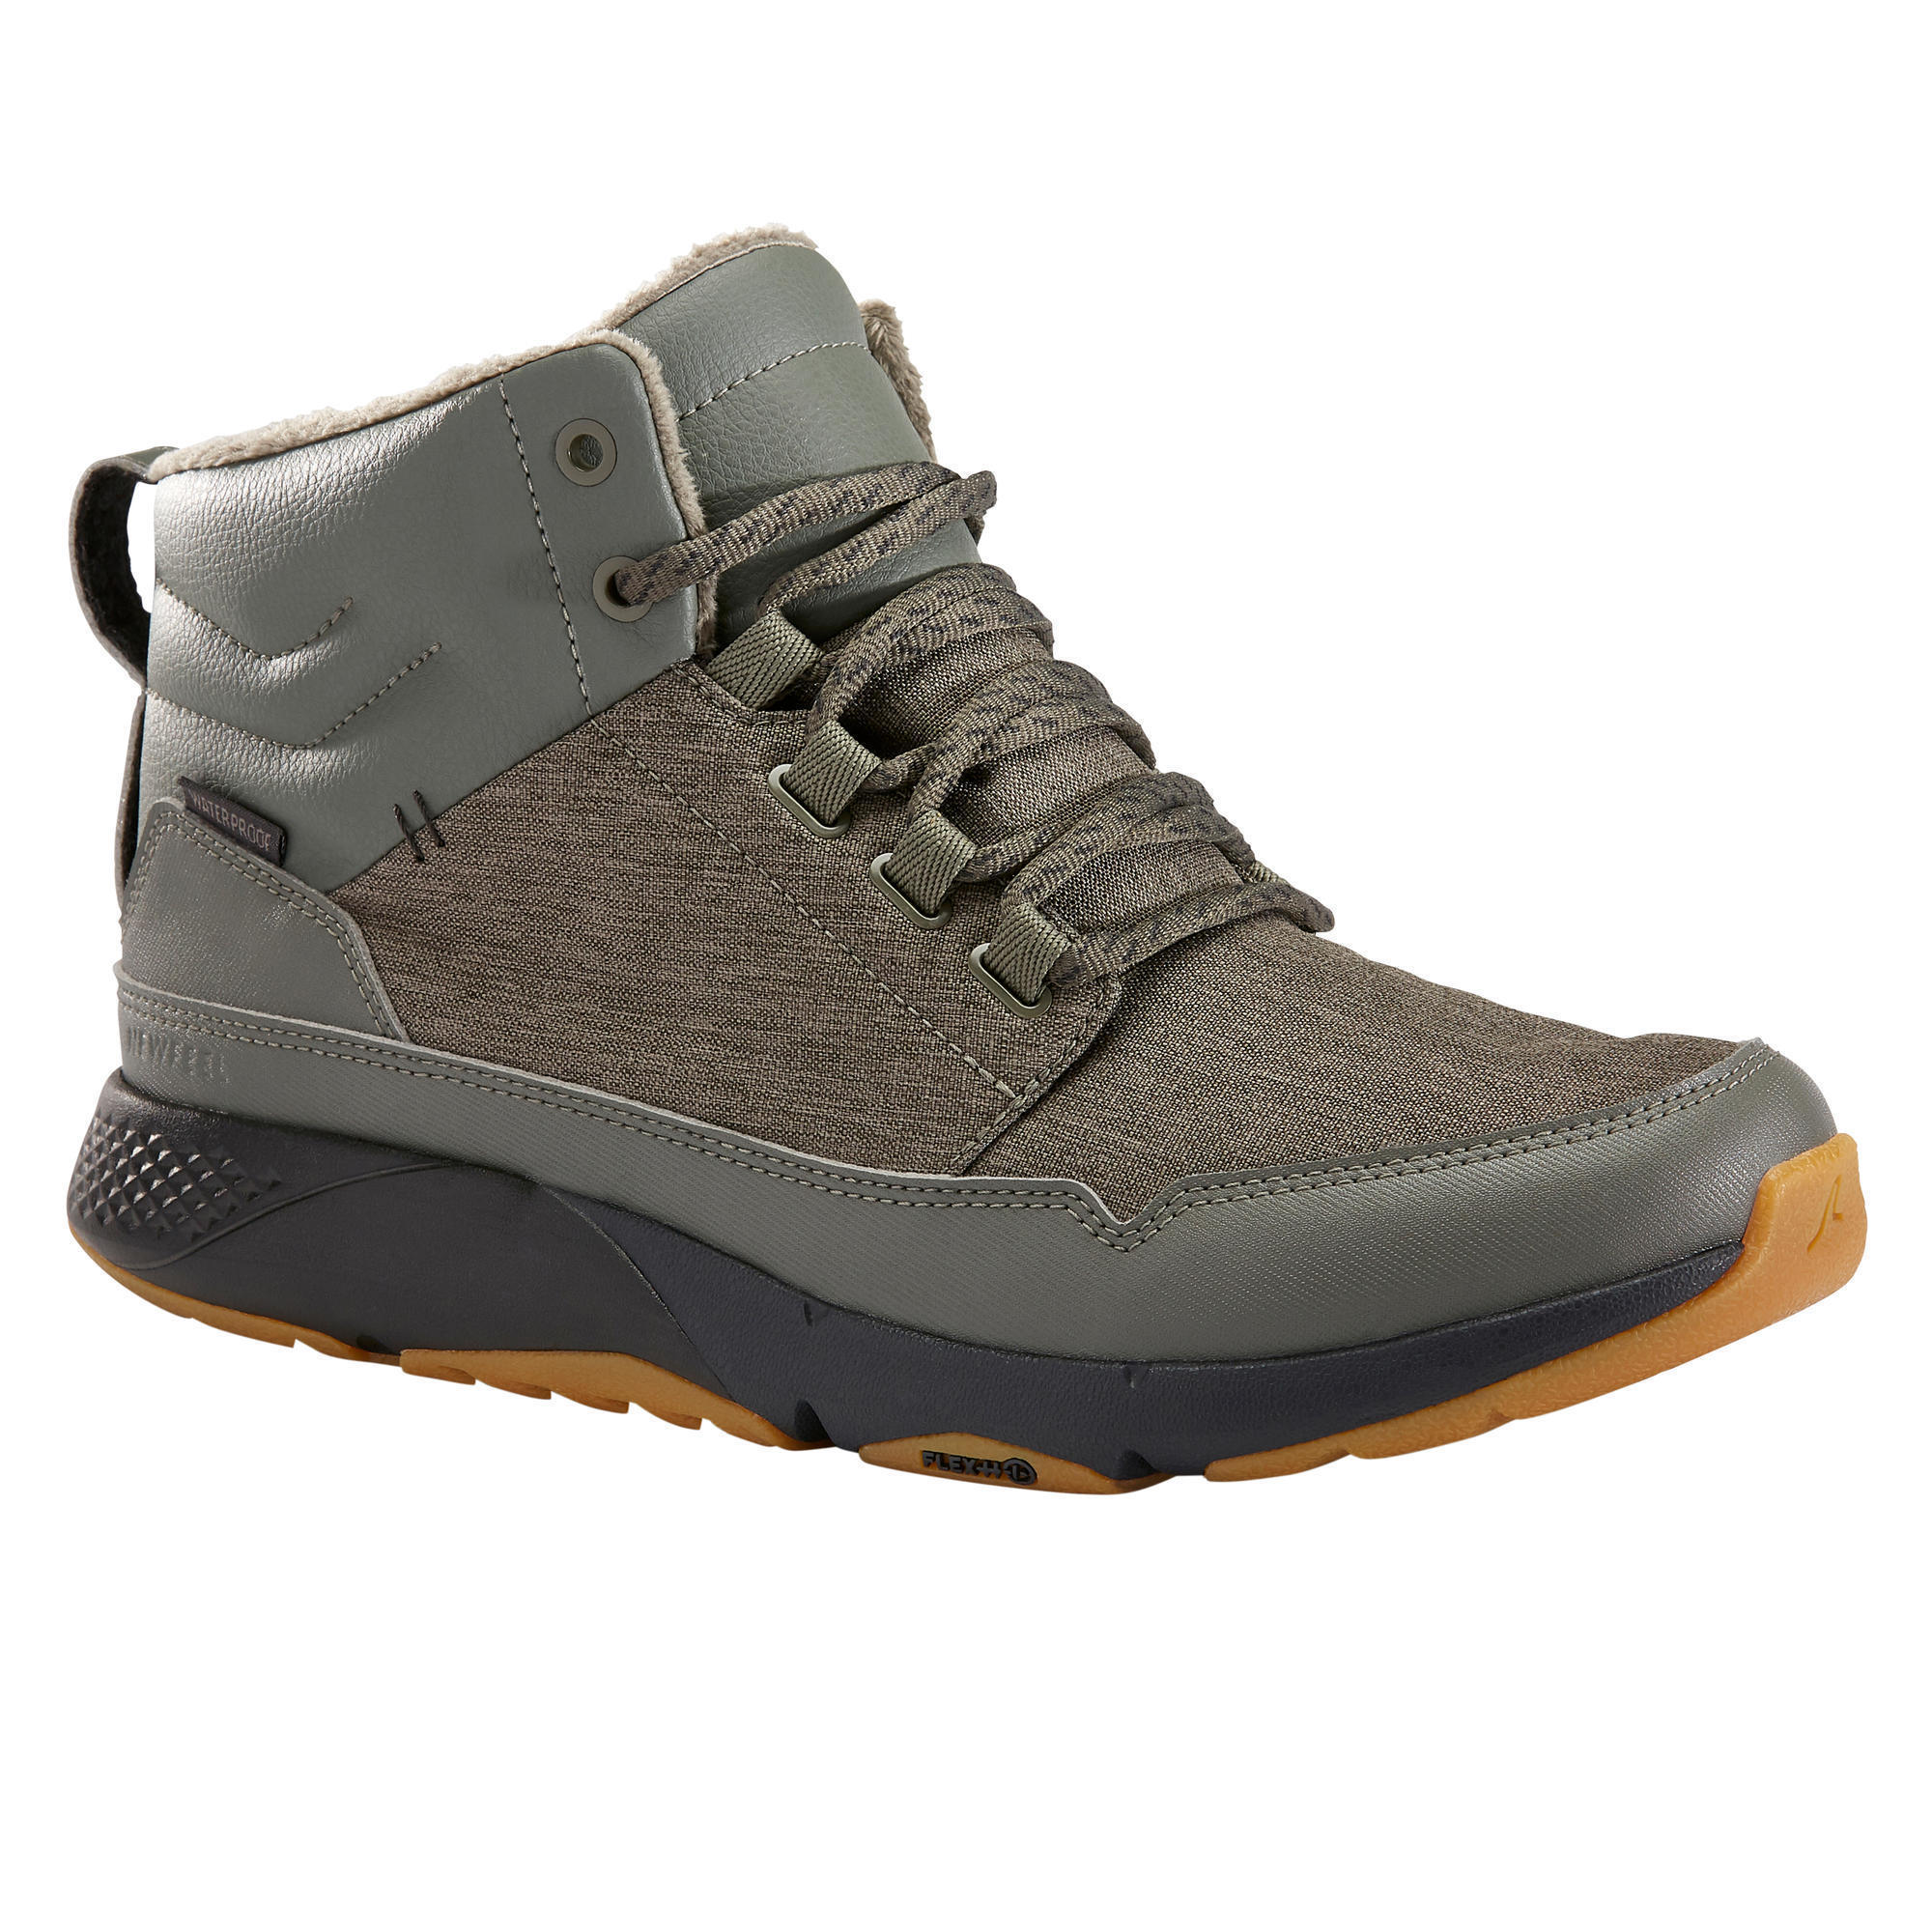 Fitness Walking Shoes Actiwalk Warm